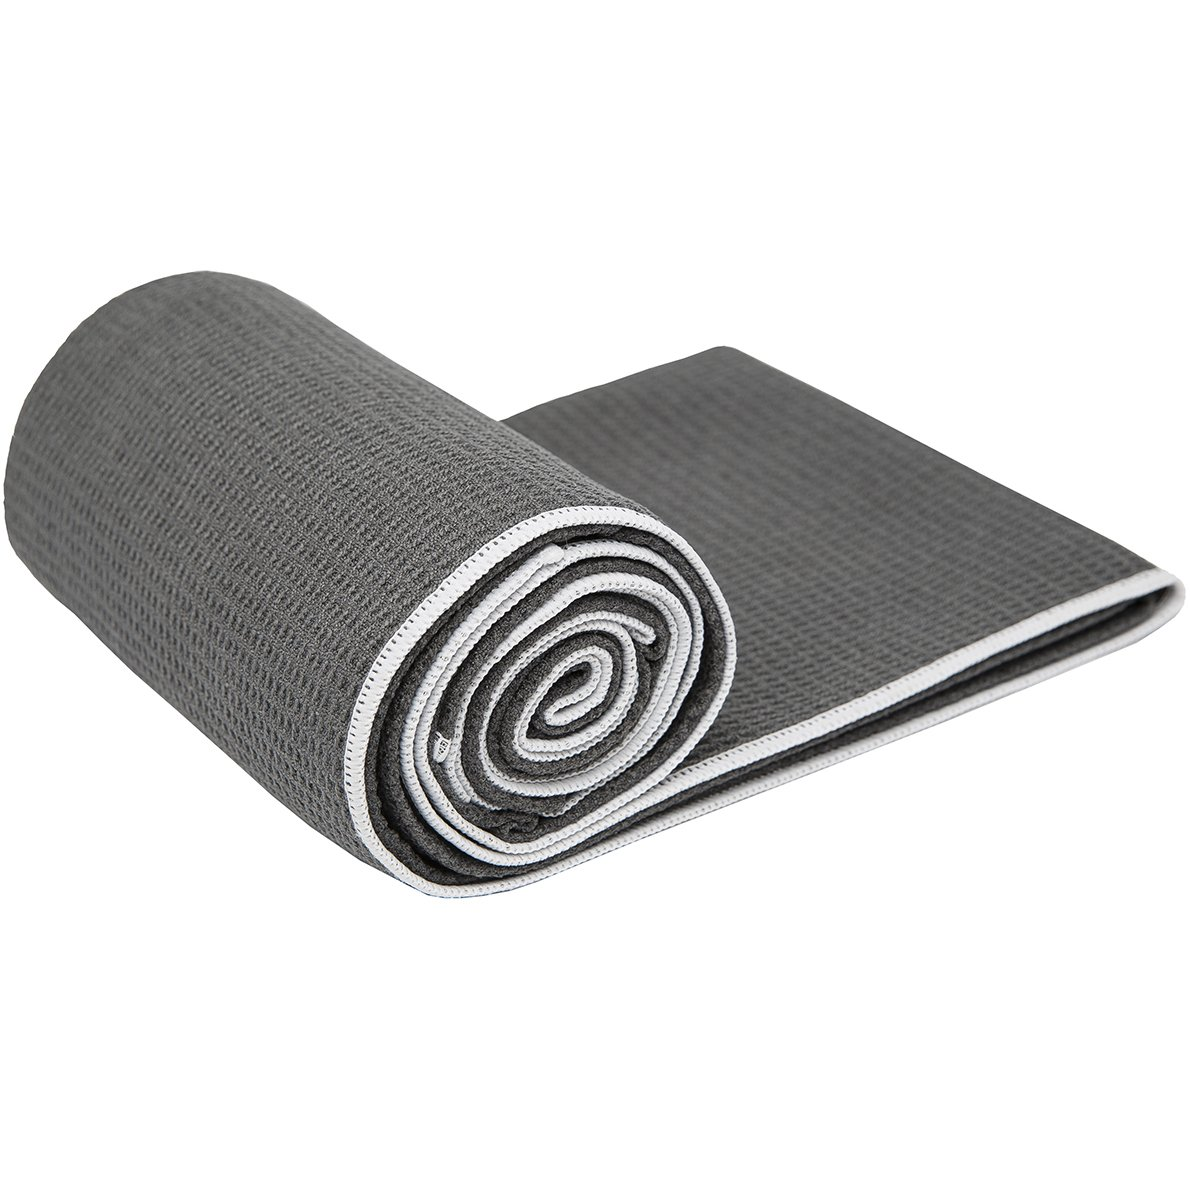 #2 Rated Hot Yoga Towel - Shandali Stickyfiber Yoga Towel - Mat-Sized, Microfiber, Super Absorbent, Anti-slip, Injury Free, 24'' x 72'' - Best Bikram Yoga Towel - Exercise, Fitness, Pilates, and Yoga Gear; Lifetime Guarantee